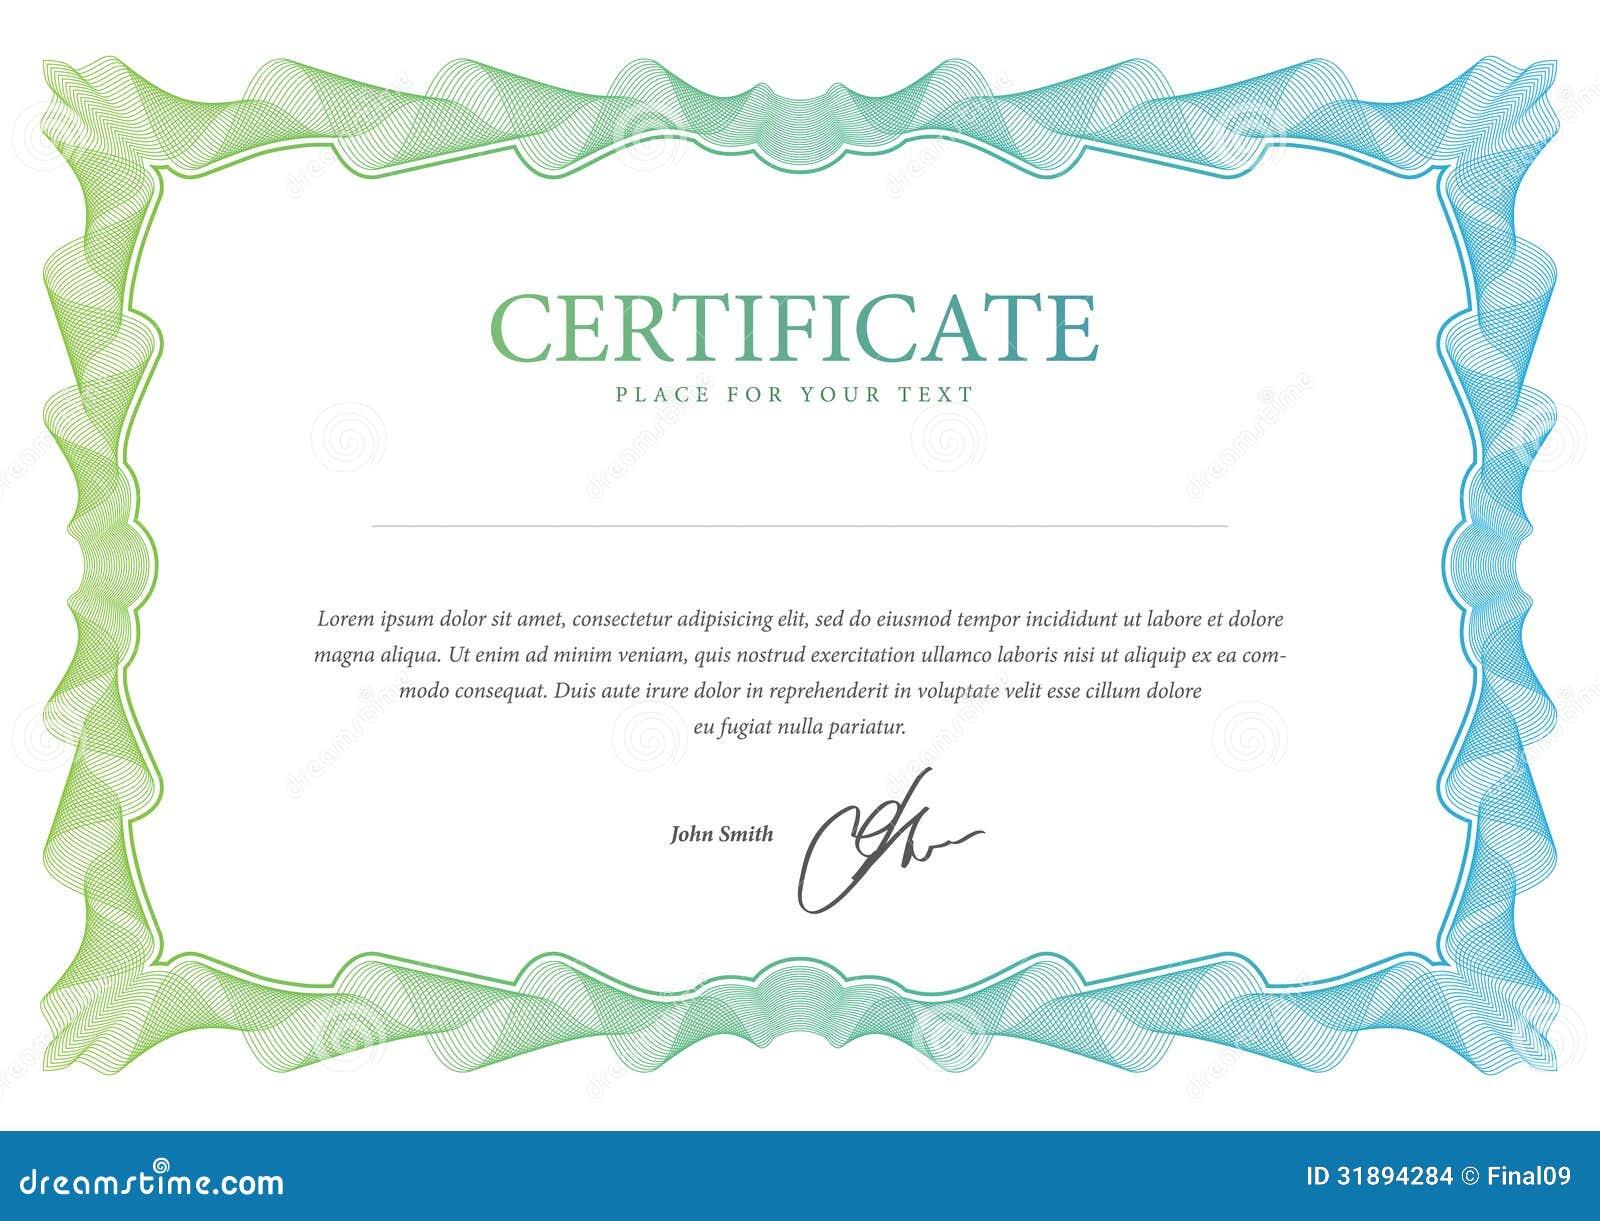 LLC Membership Certificates  Harbor Compliance